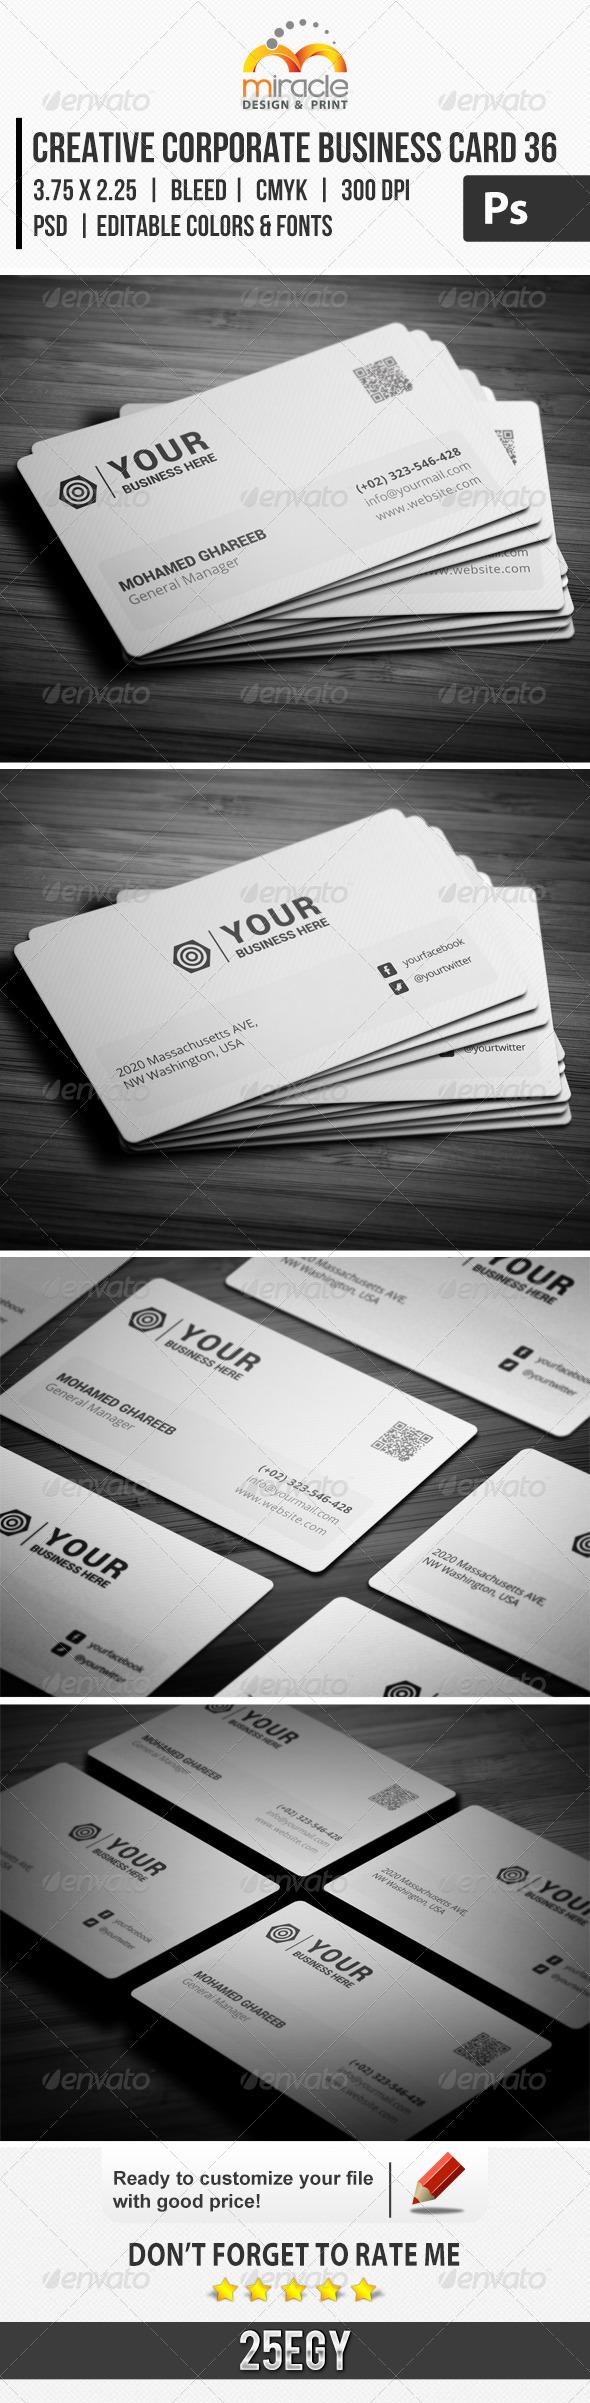 GraphicRiver Creative Corporate Business Card 36 7074837